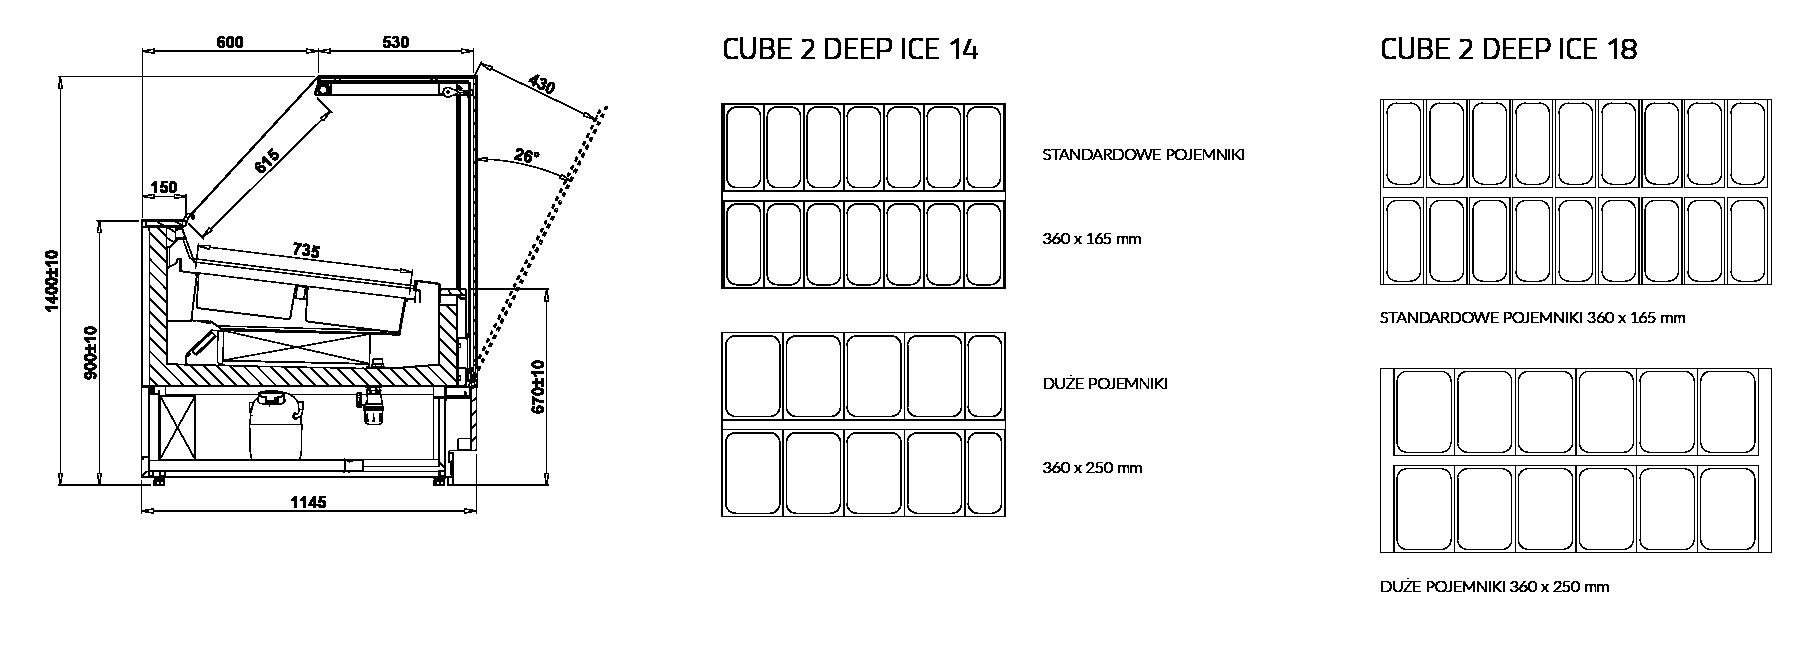 Rysunek techniczny Dystrybutor do lodów CUBE 2 DEEP ICE MOD C